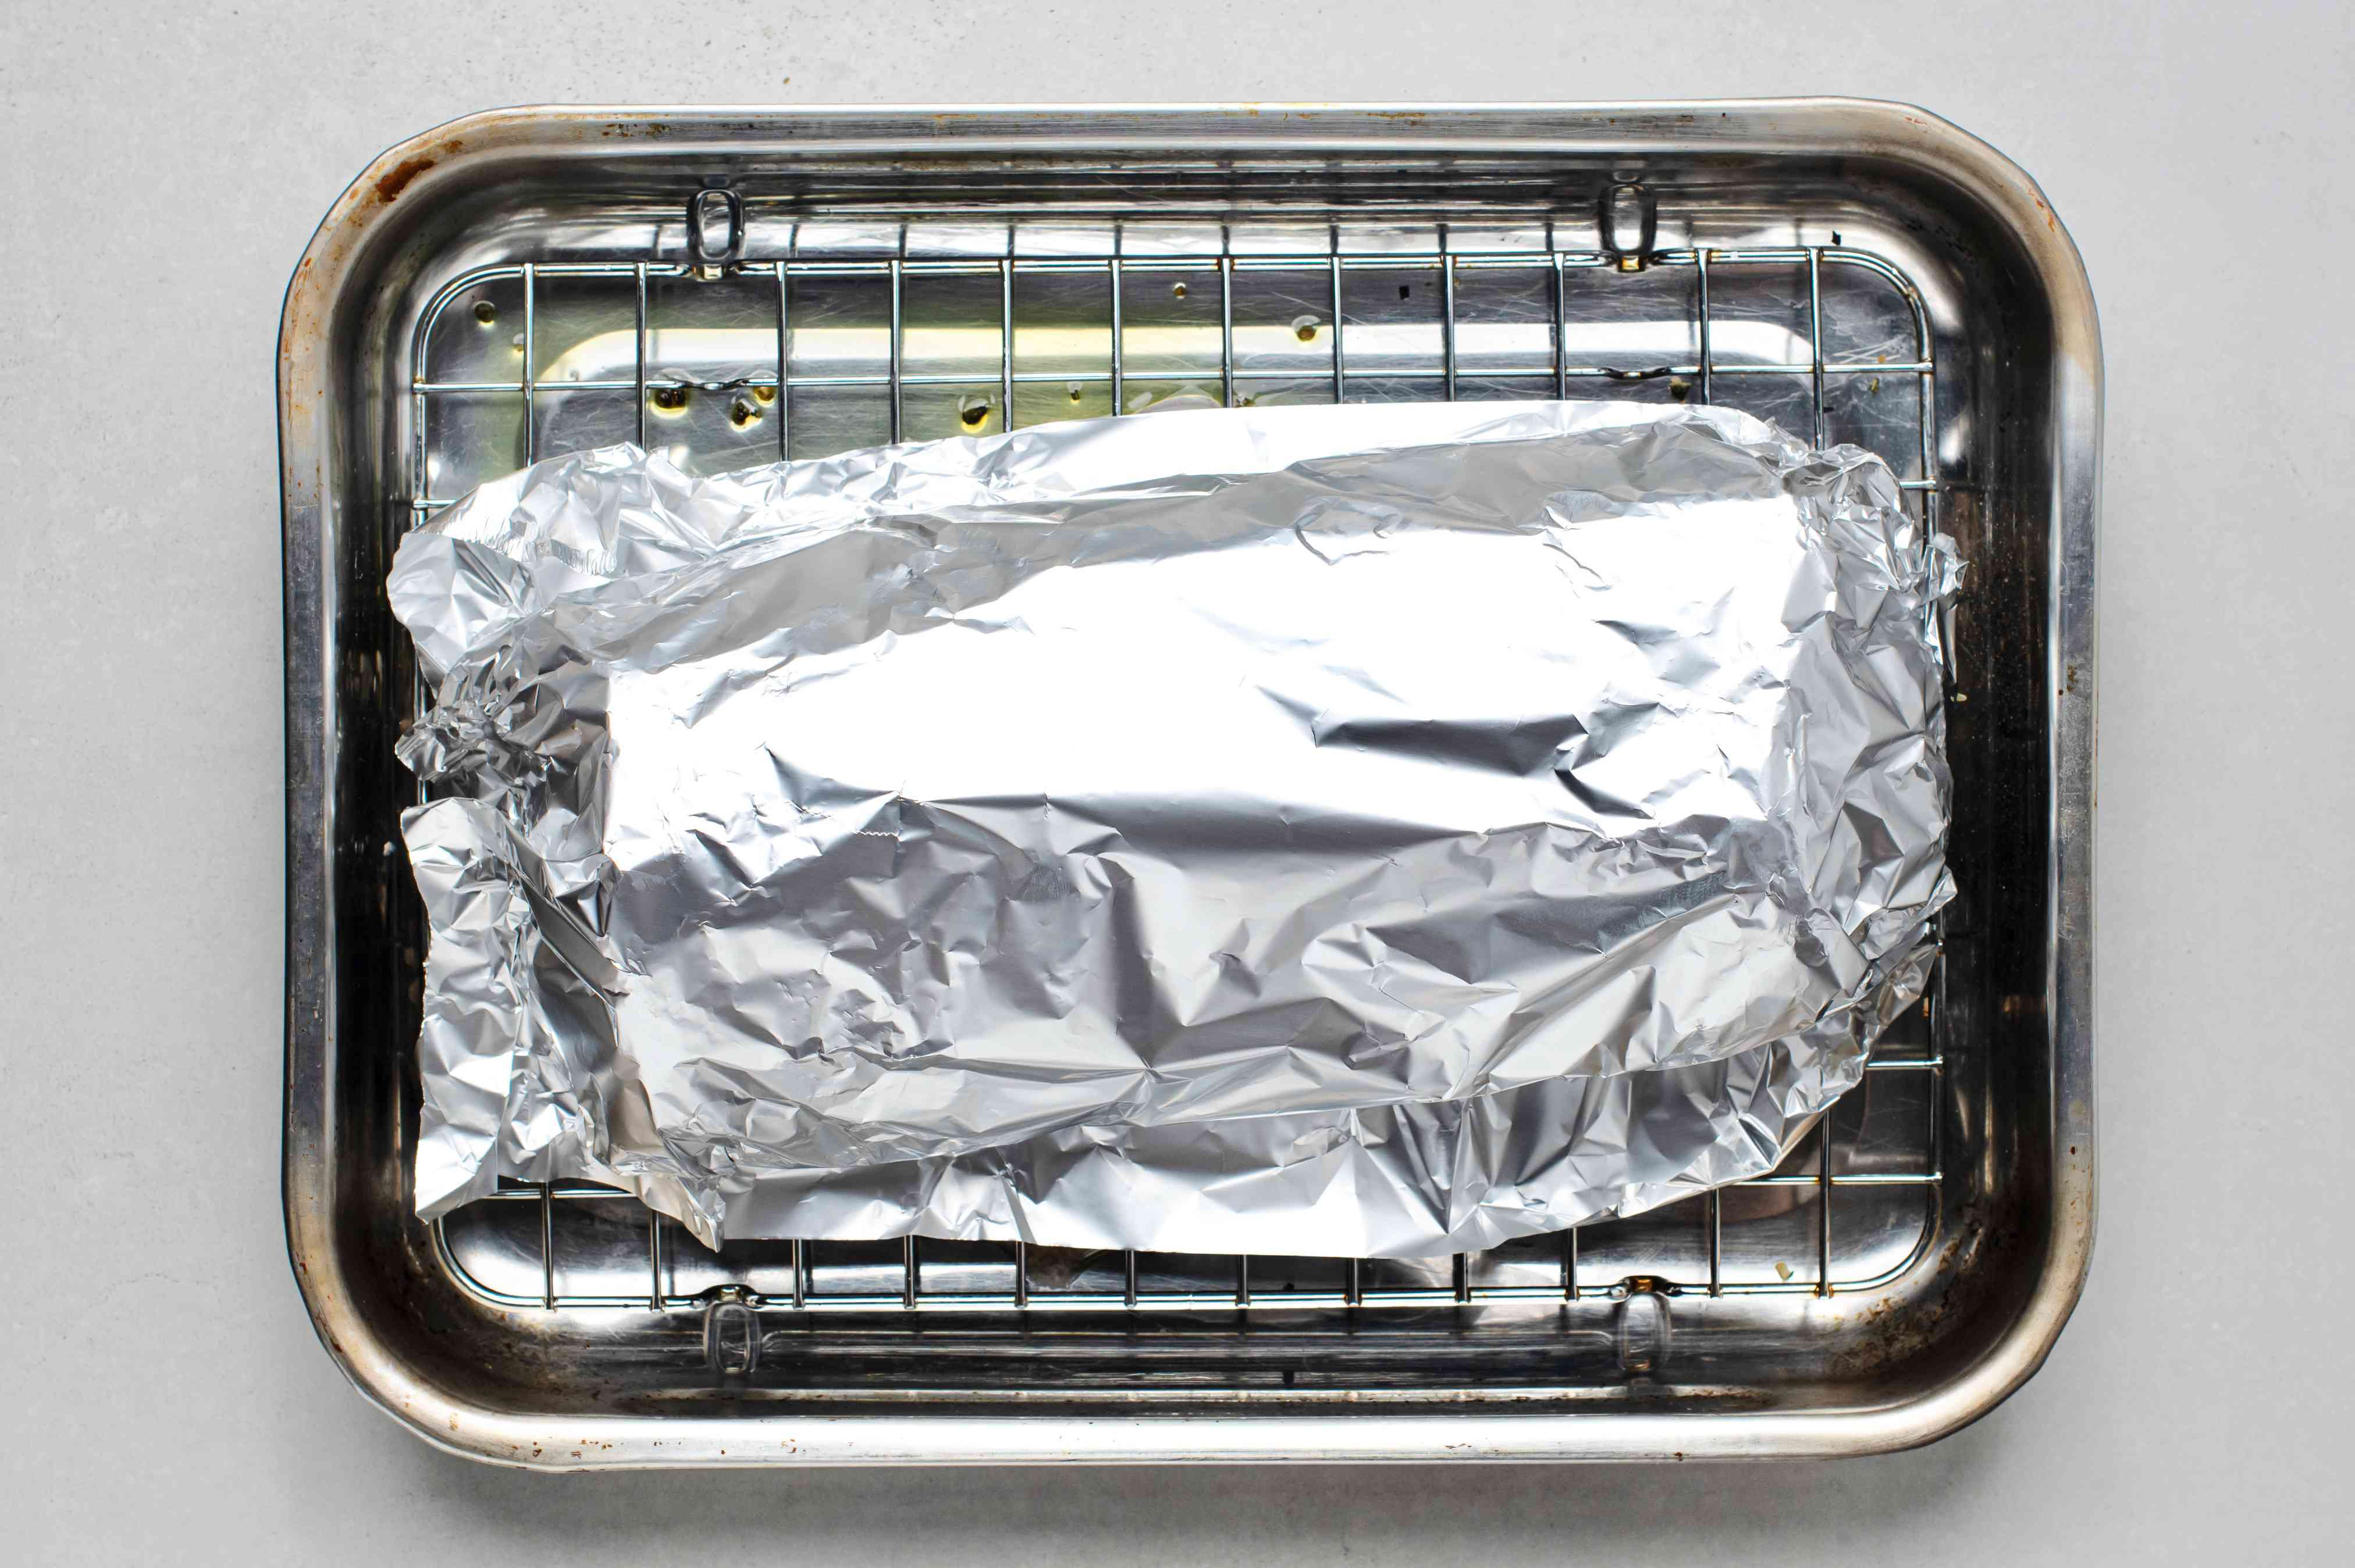 Roasted Boneless Pork Loin, wrapped with aluminum foil